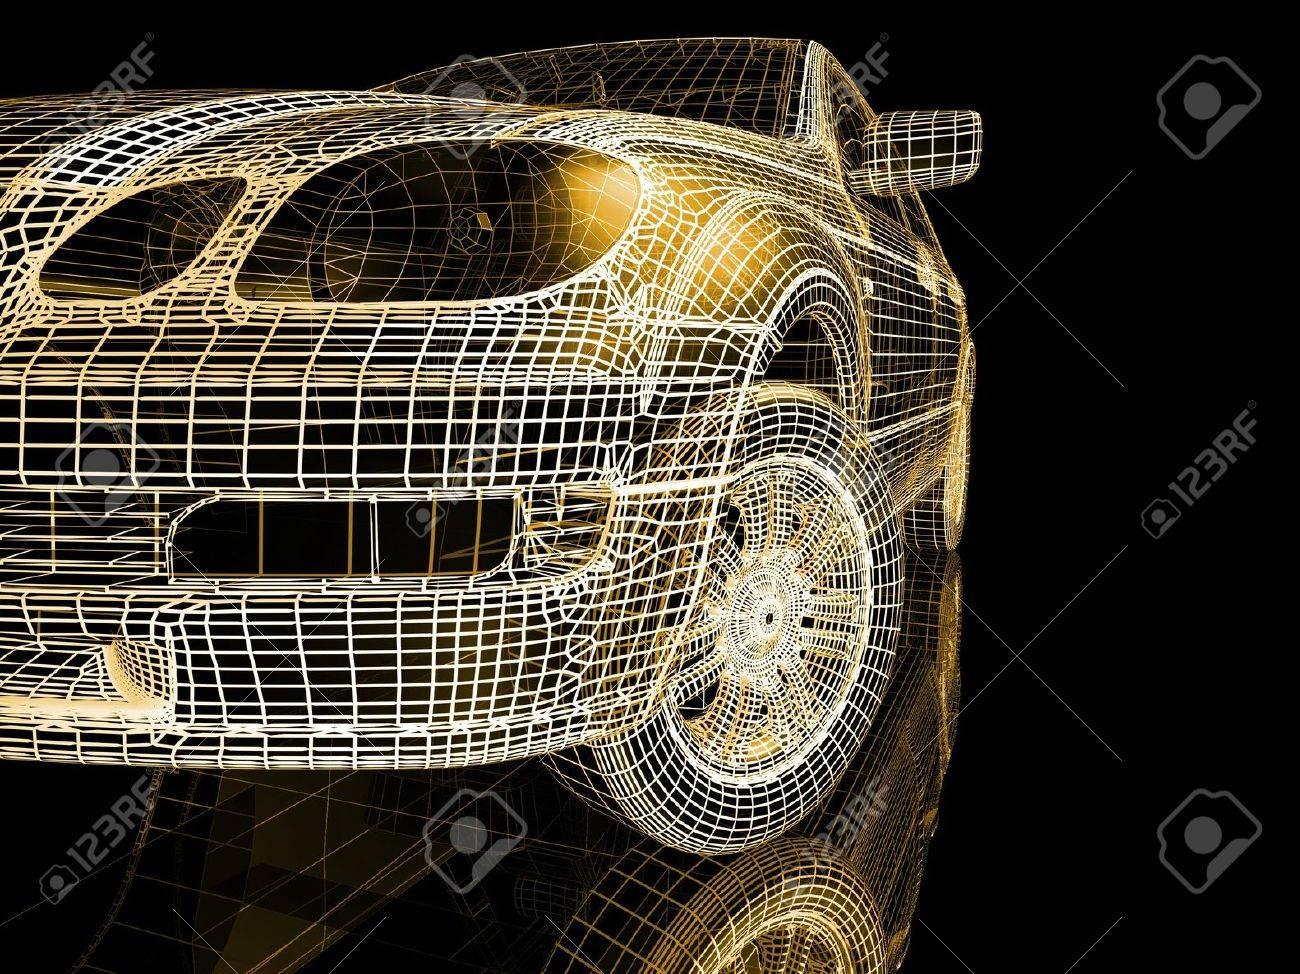 Car model Stock Photo - 7345827